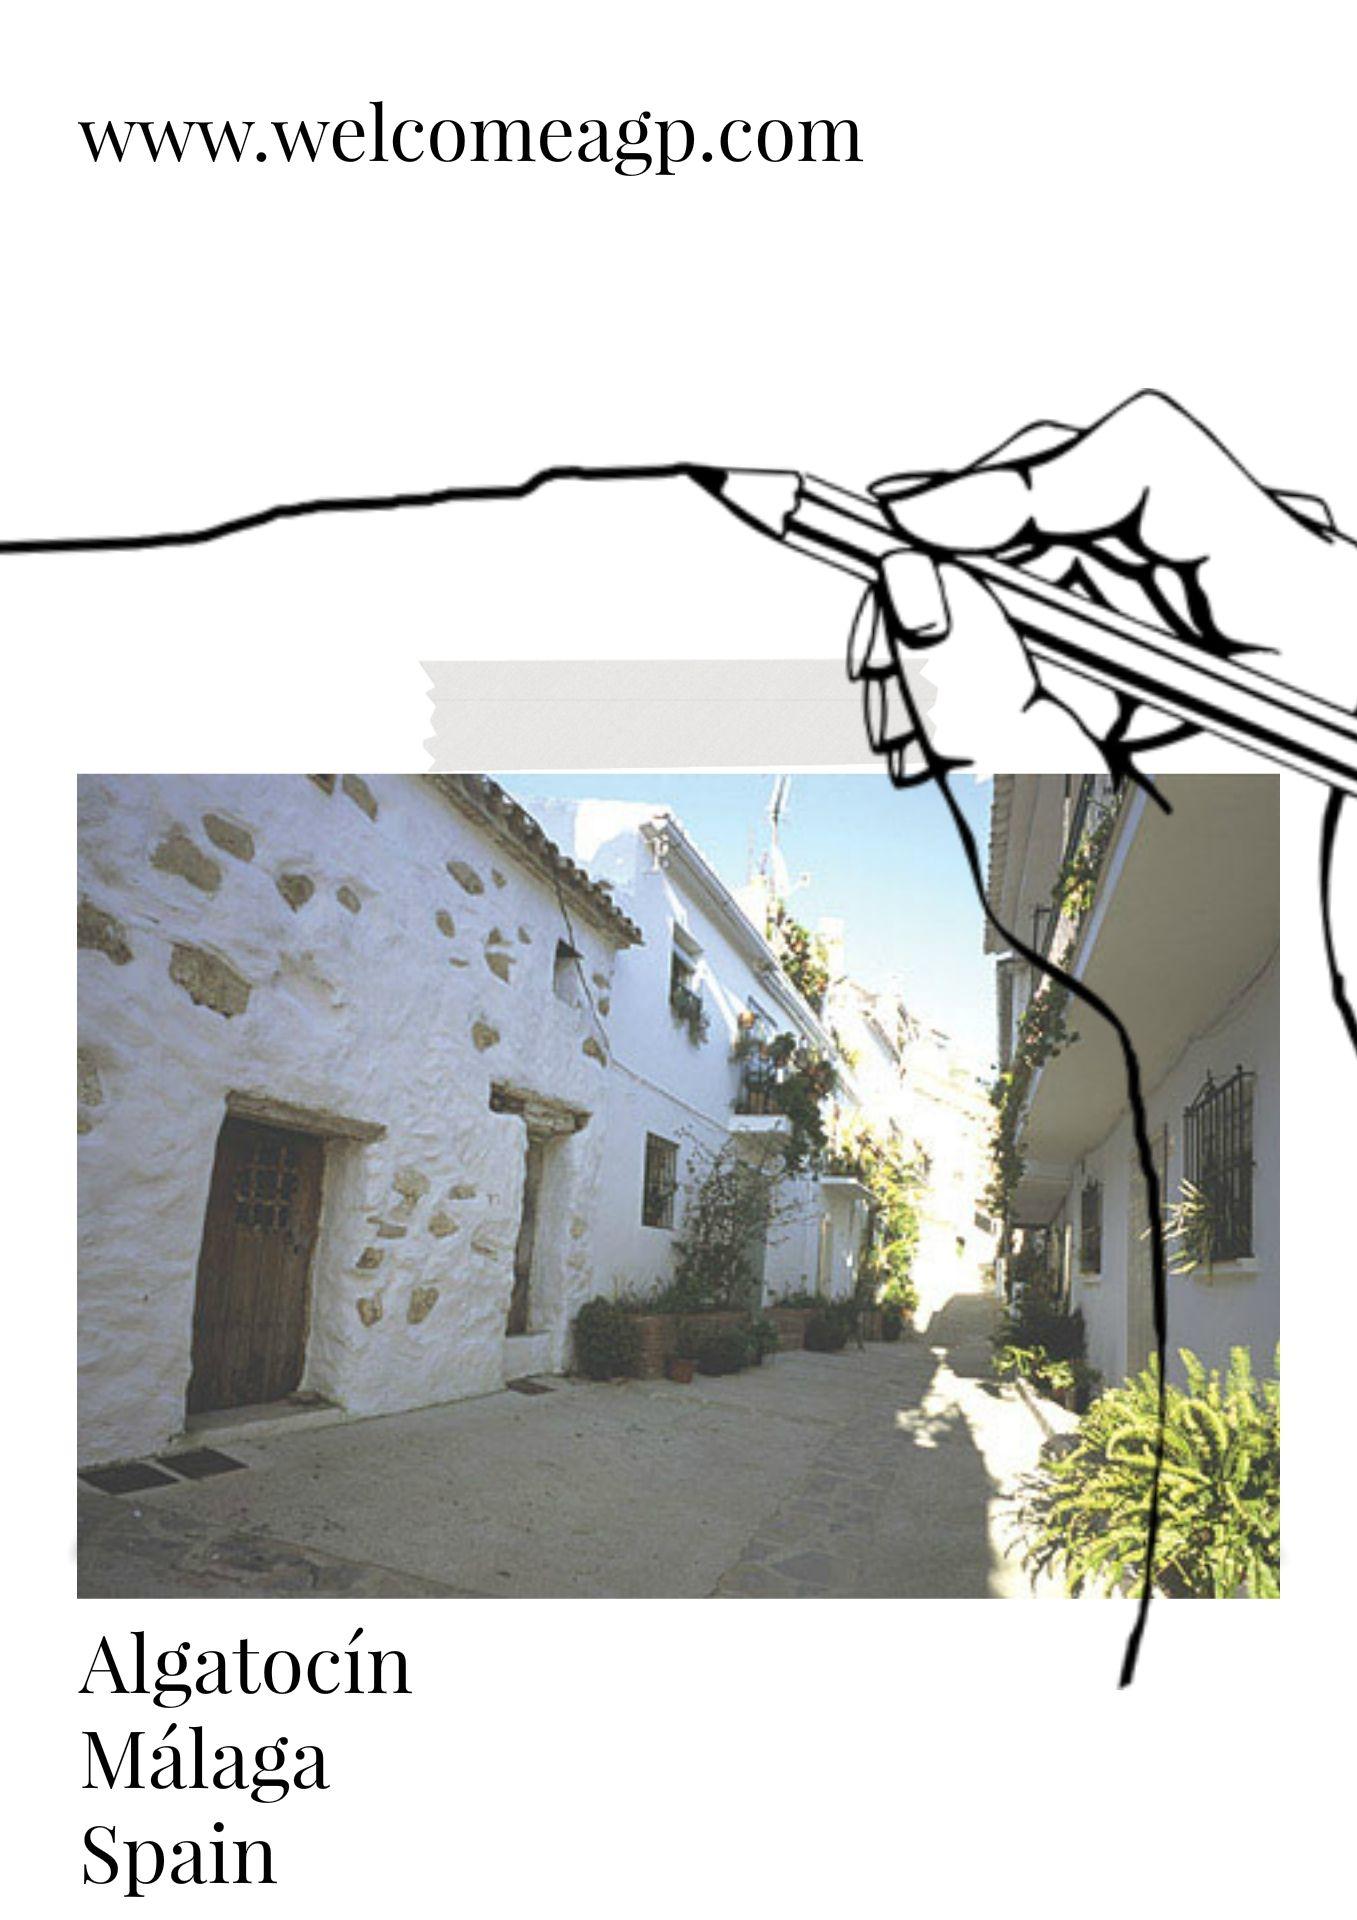 @Algatocin #Malaga #Spain